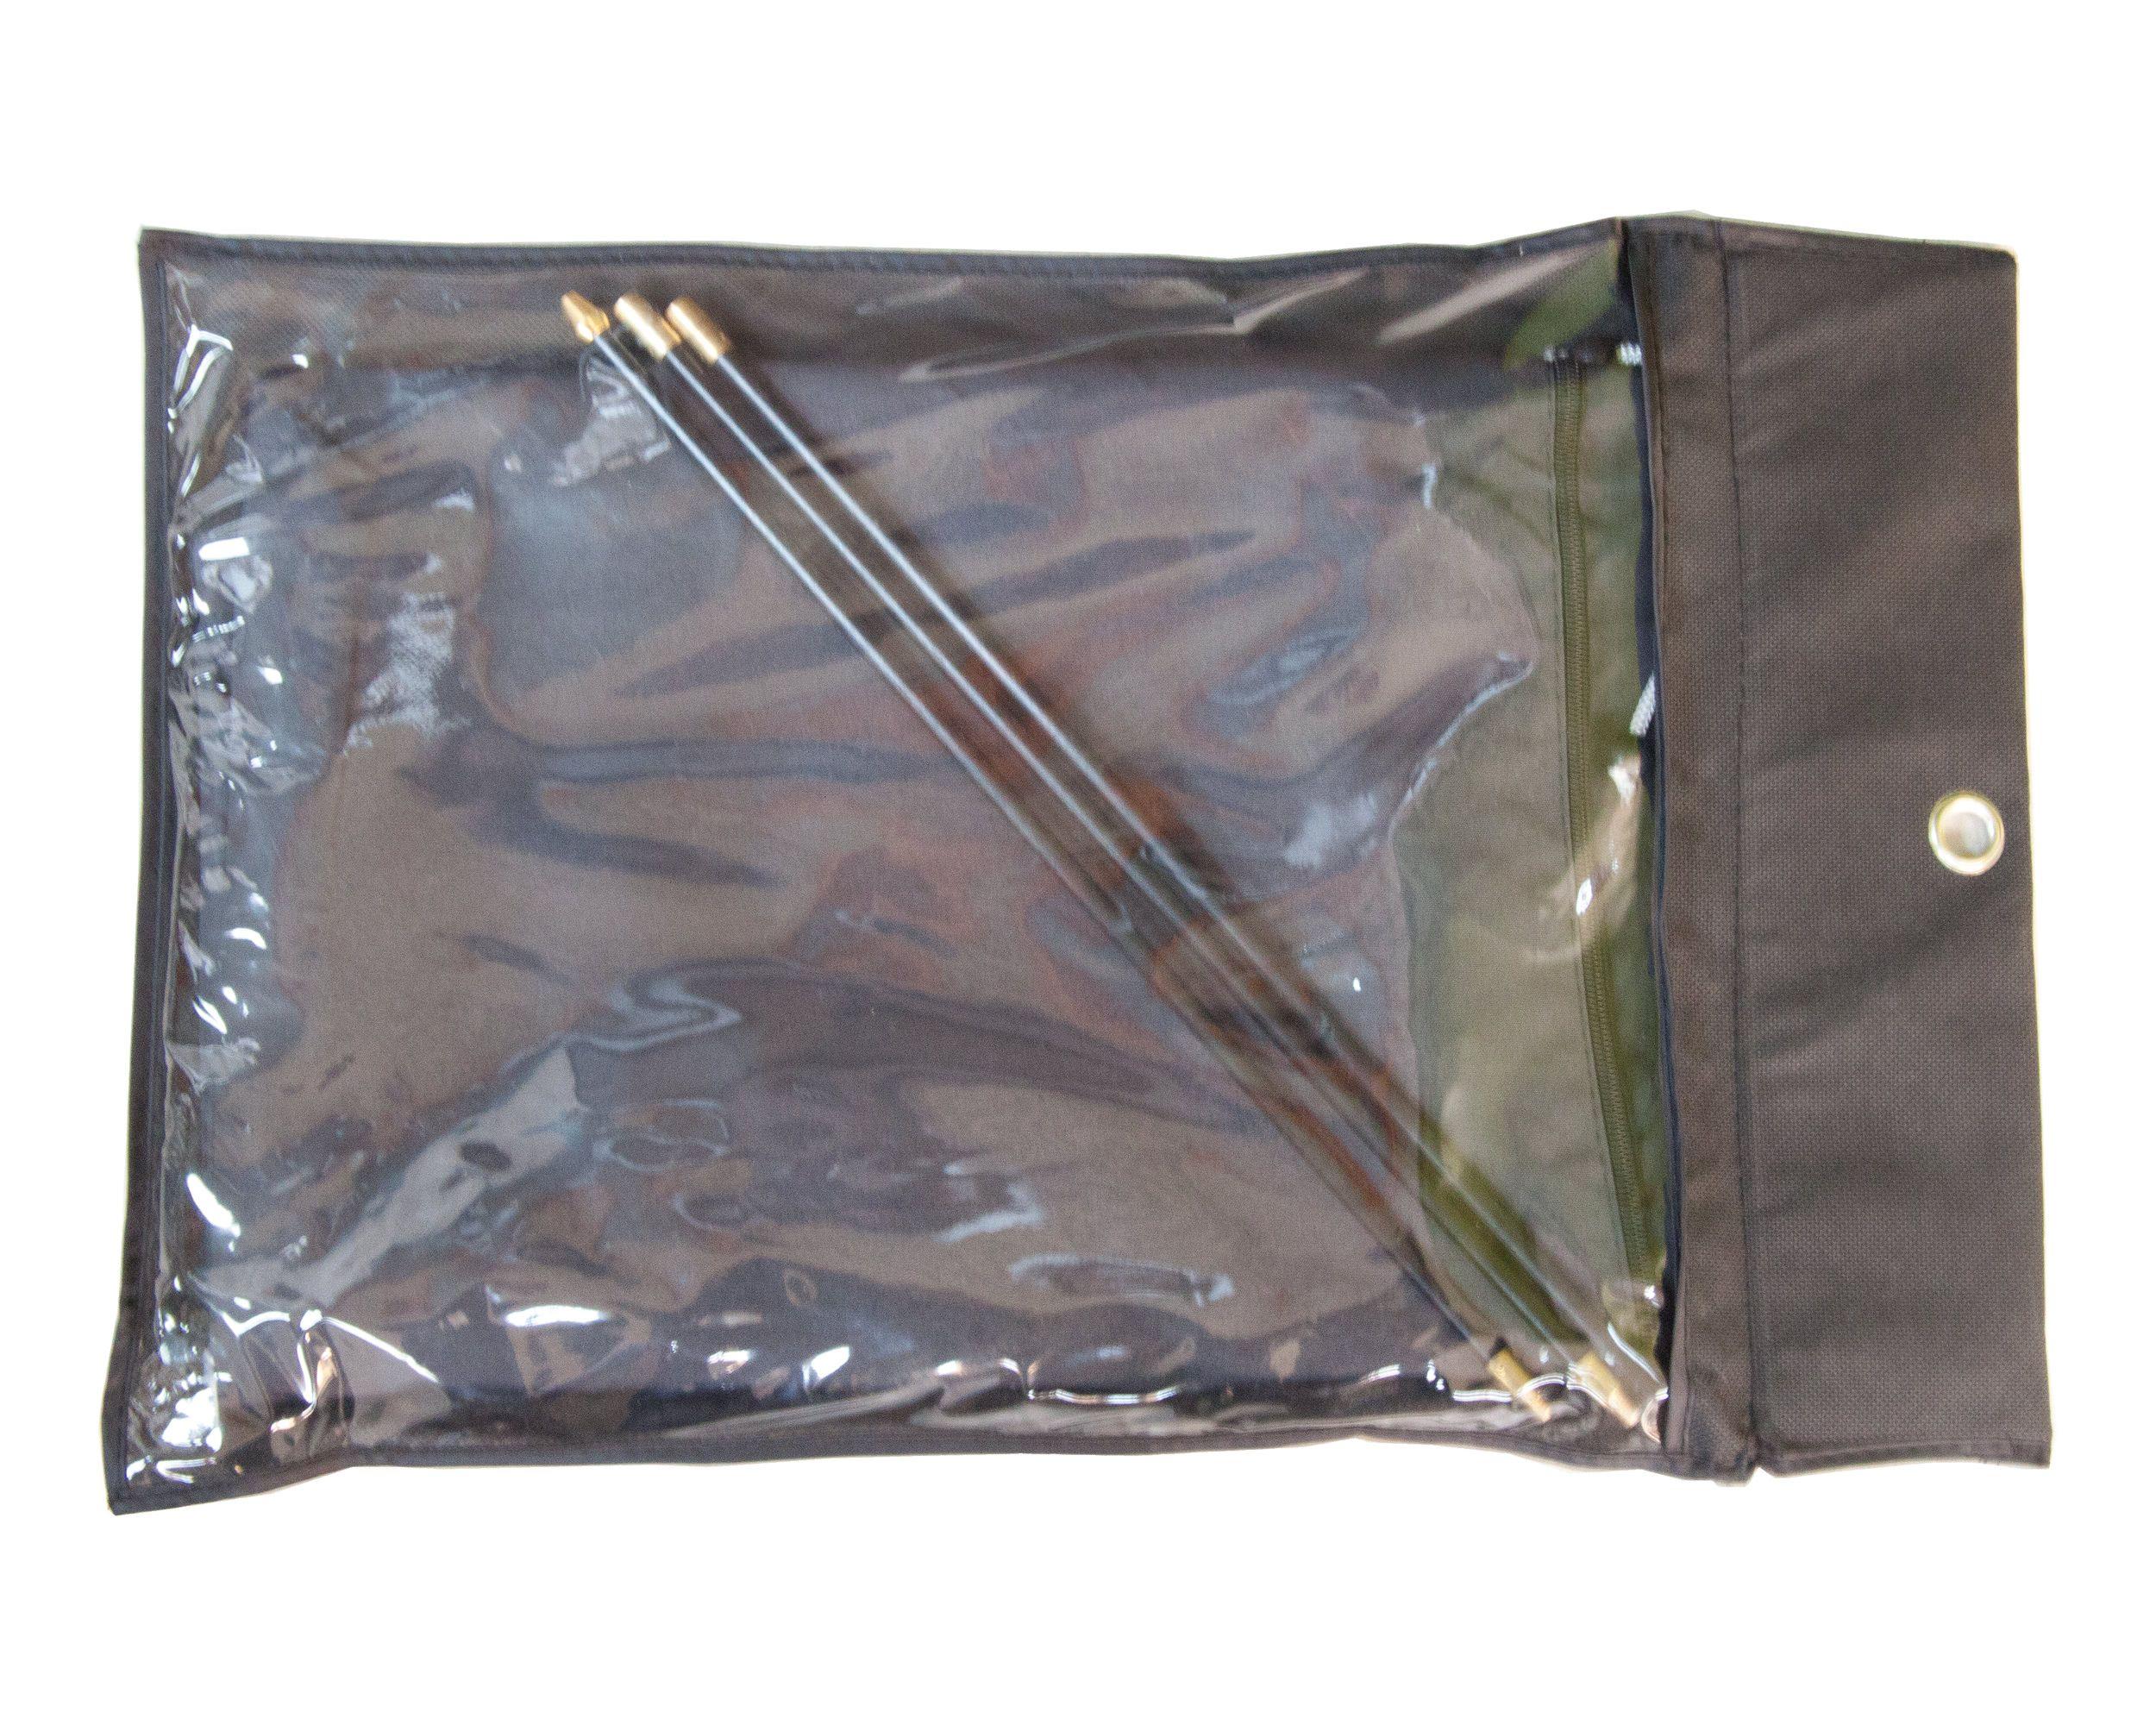 Schutzhülle Sonnenschirme 300-350cm & 250x250cm